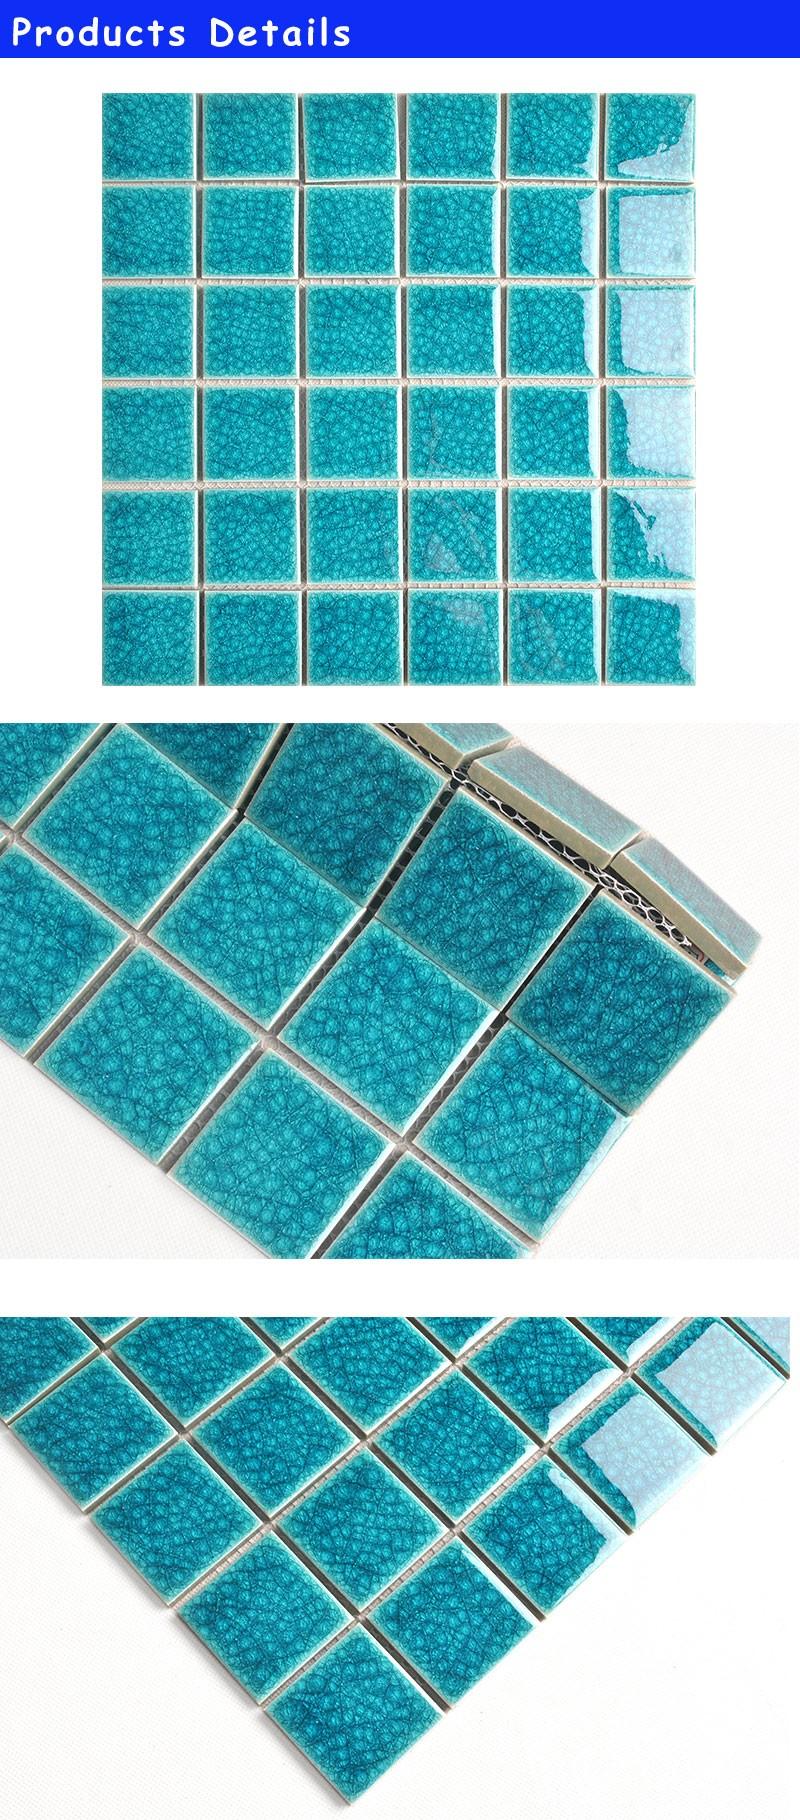 Craft mosaic tiles cheap - Cheap Bathroom Wall Mosaic Ceramic Letter Mosaic Tiles For Crafts